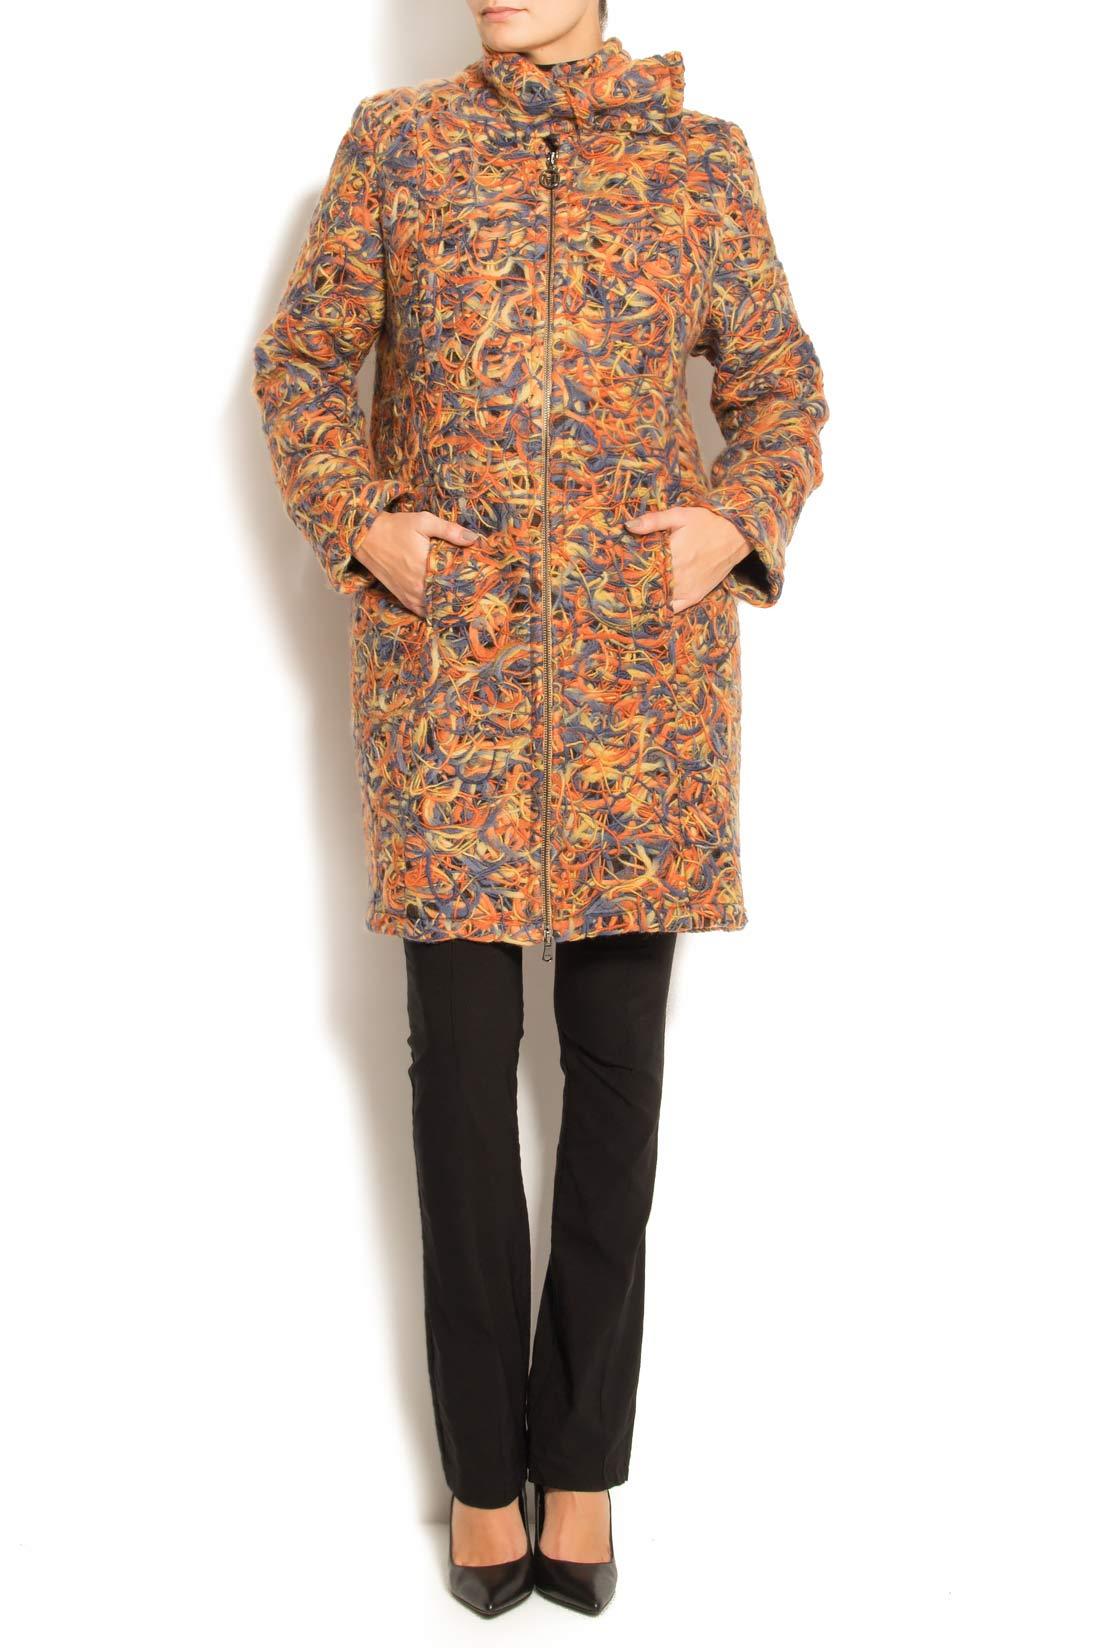 Palton din lana cu buzunare laterale Arina Varga imagine 0